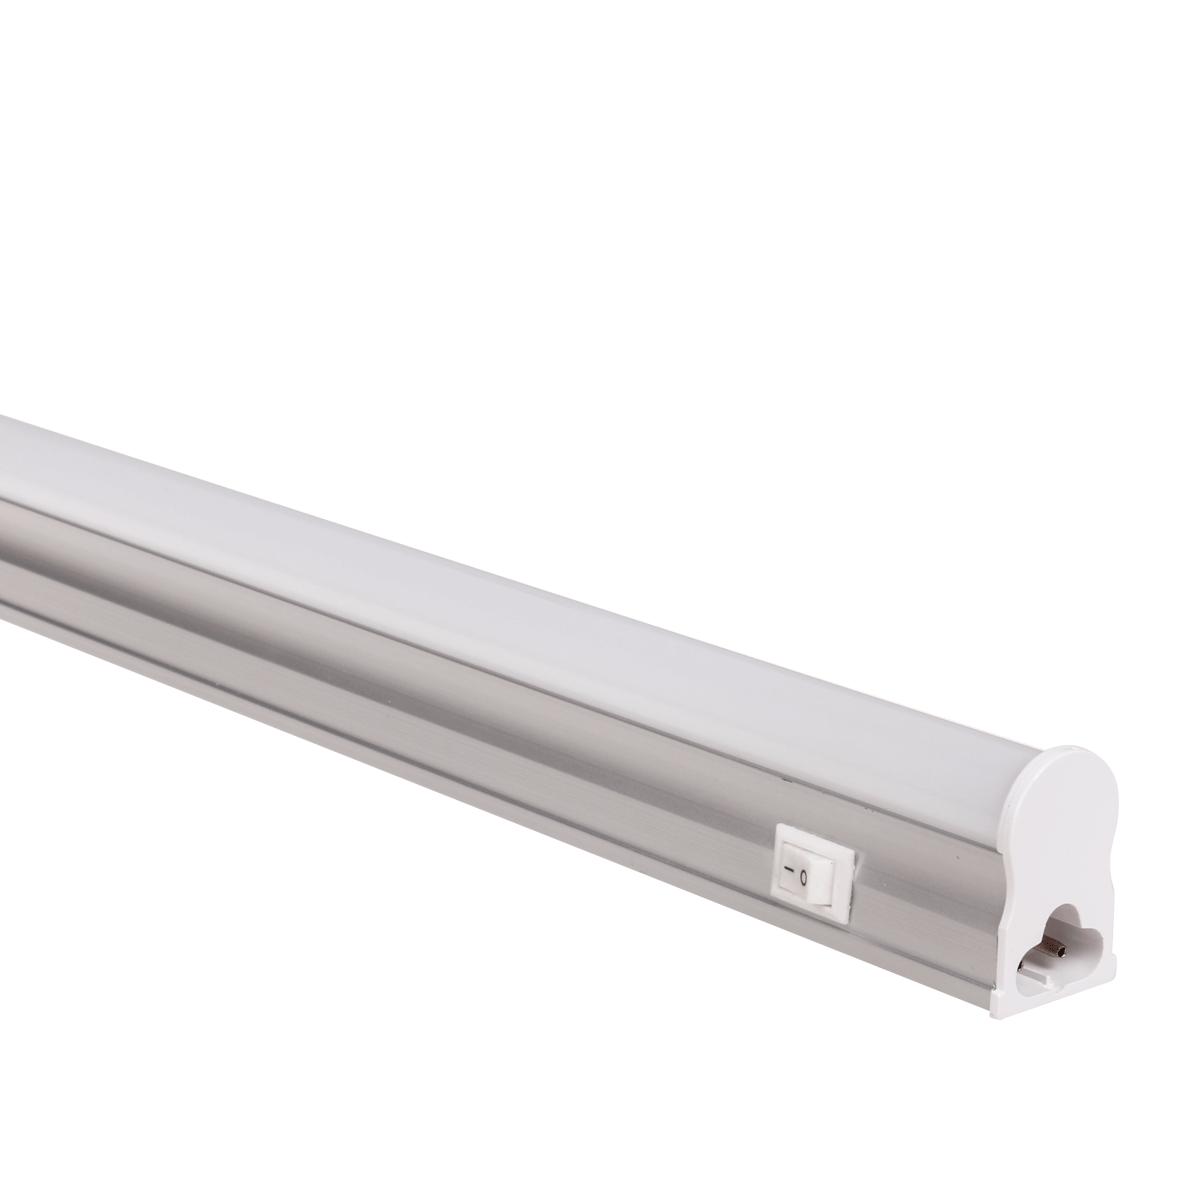 Luminaria Linear Led T5 Com Interruptor 18w 3000k Bivolt 120cm